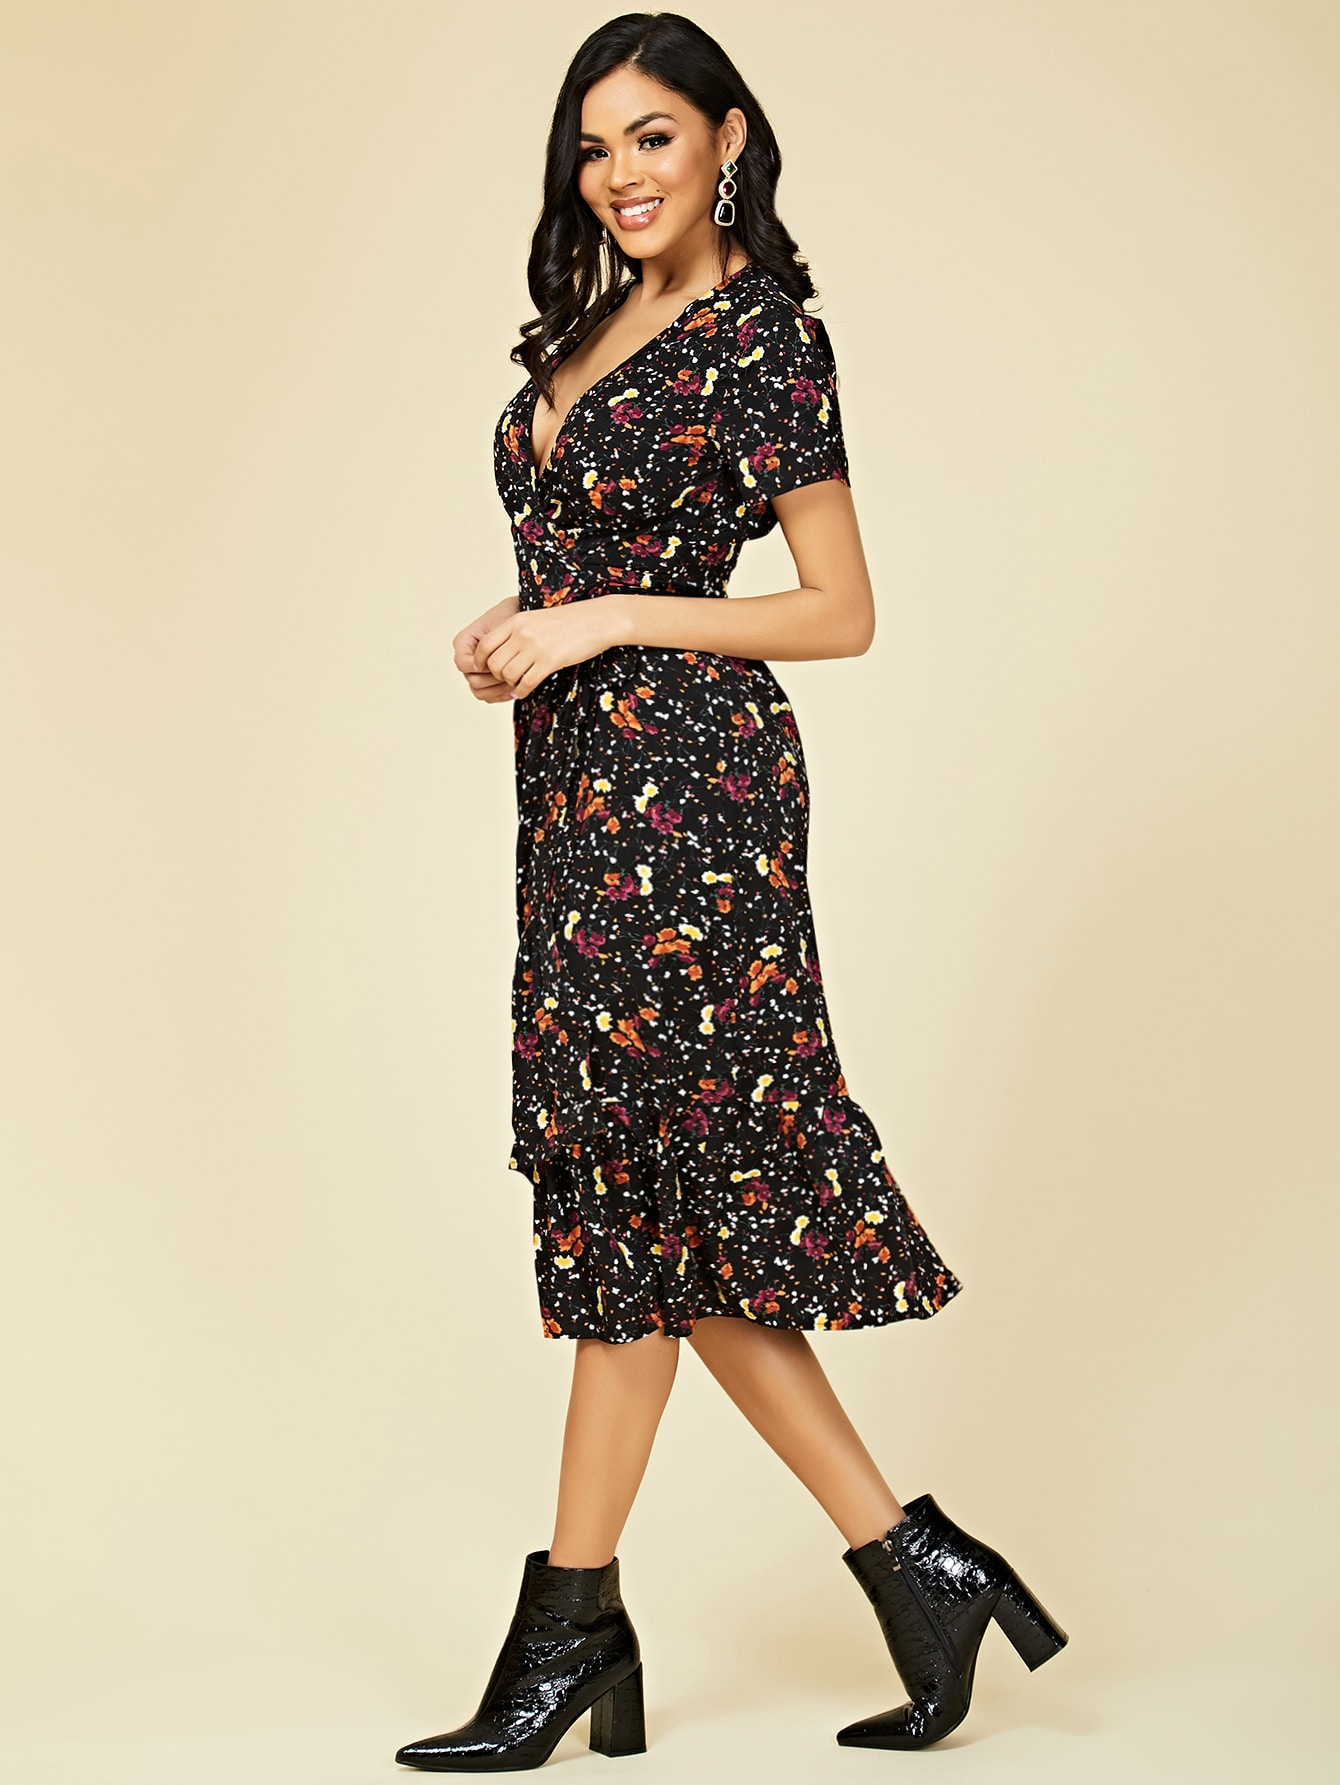 Best Plus Size Dresses for Party